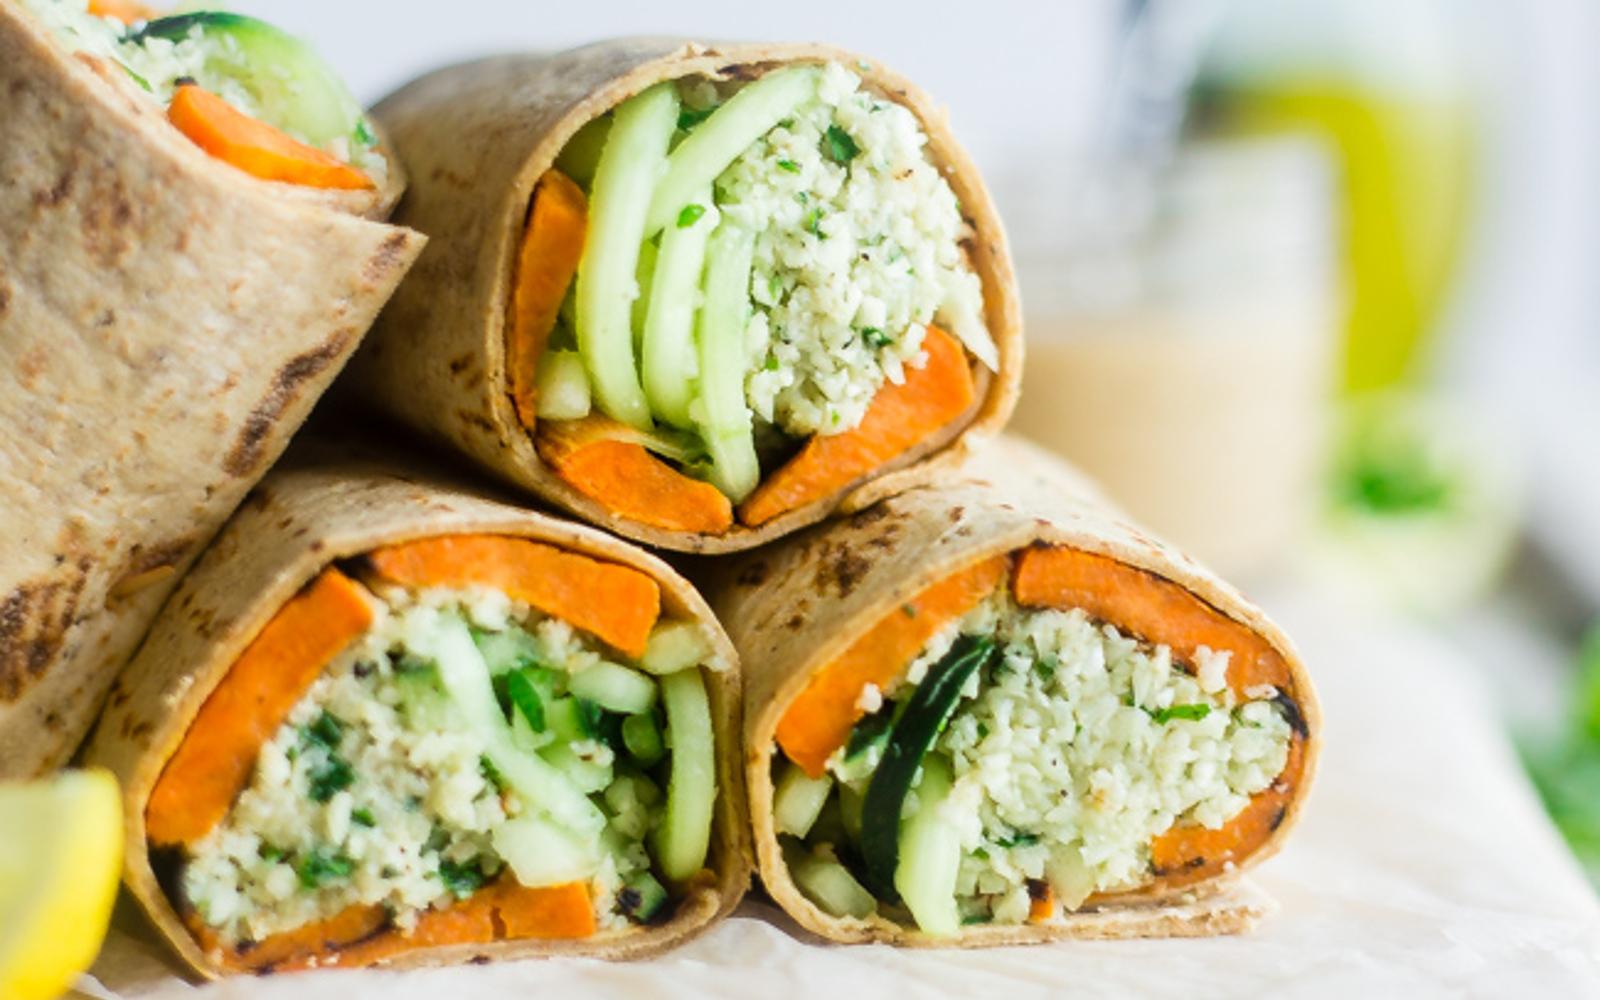 Mint Grilled Sweet Potato and Tahini Cauliflower Rice Wraps